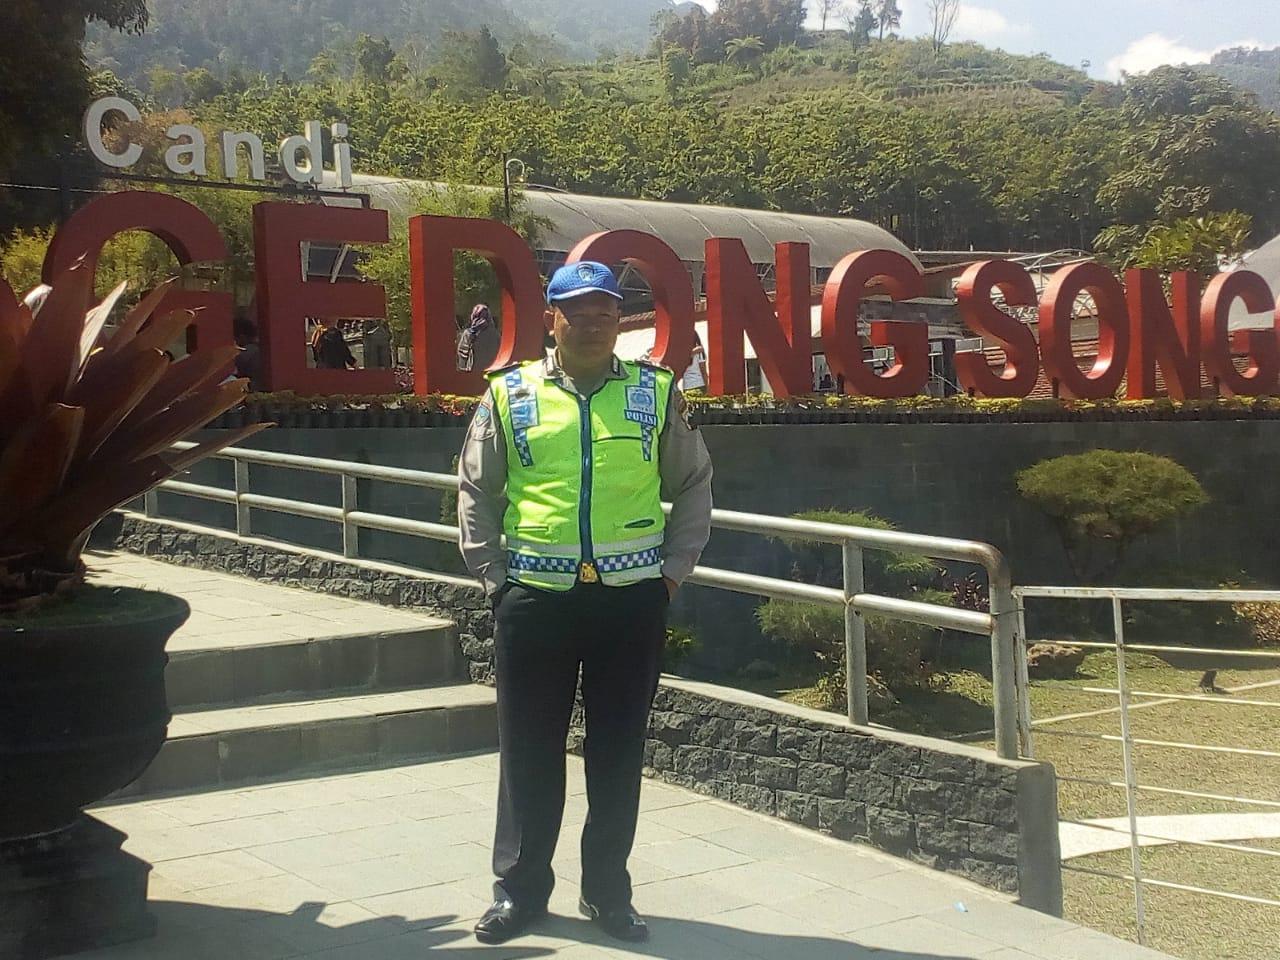 Polsek Bandungan Siap Amankan Obyek Wisata Di Akhir Pekan